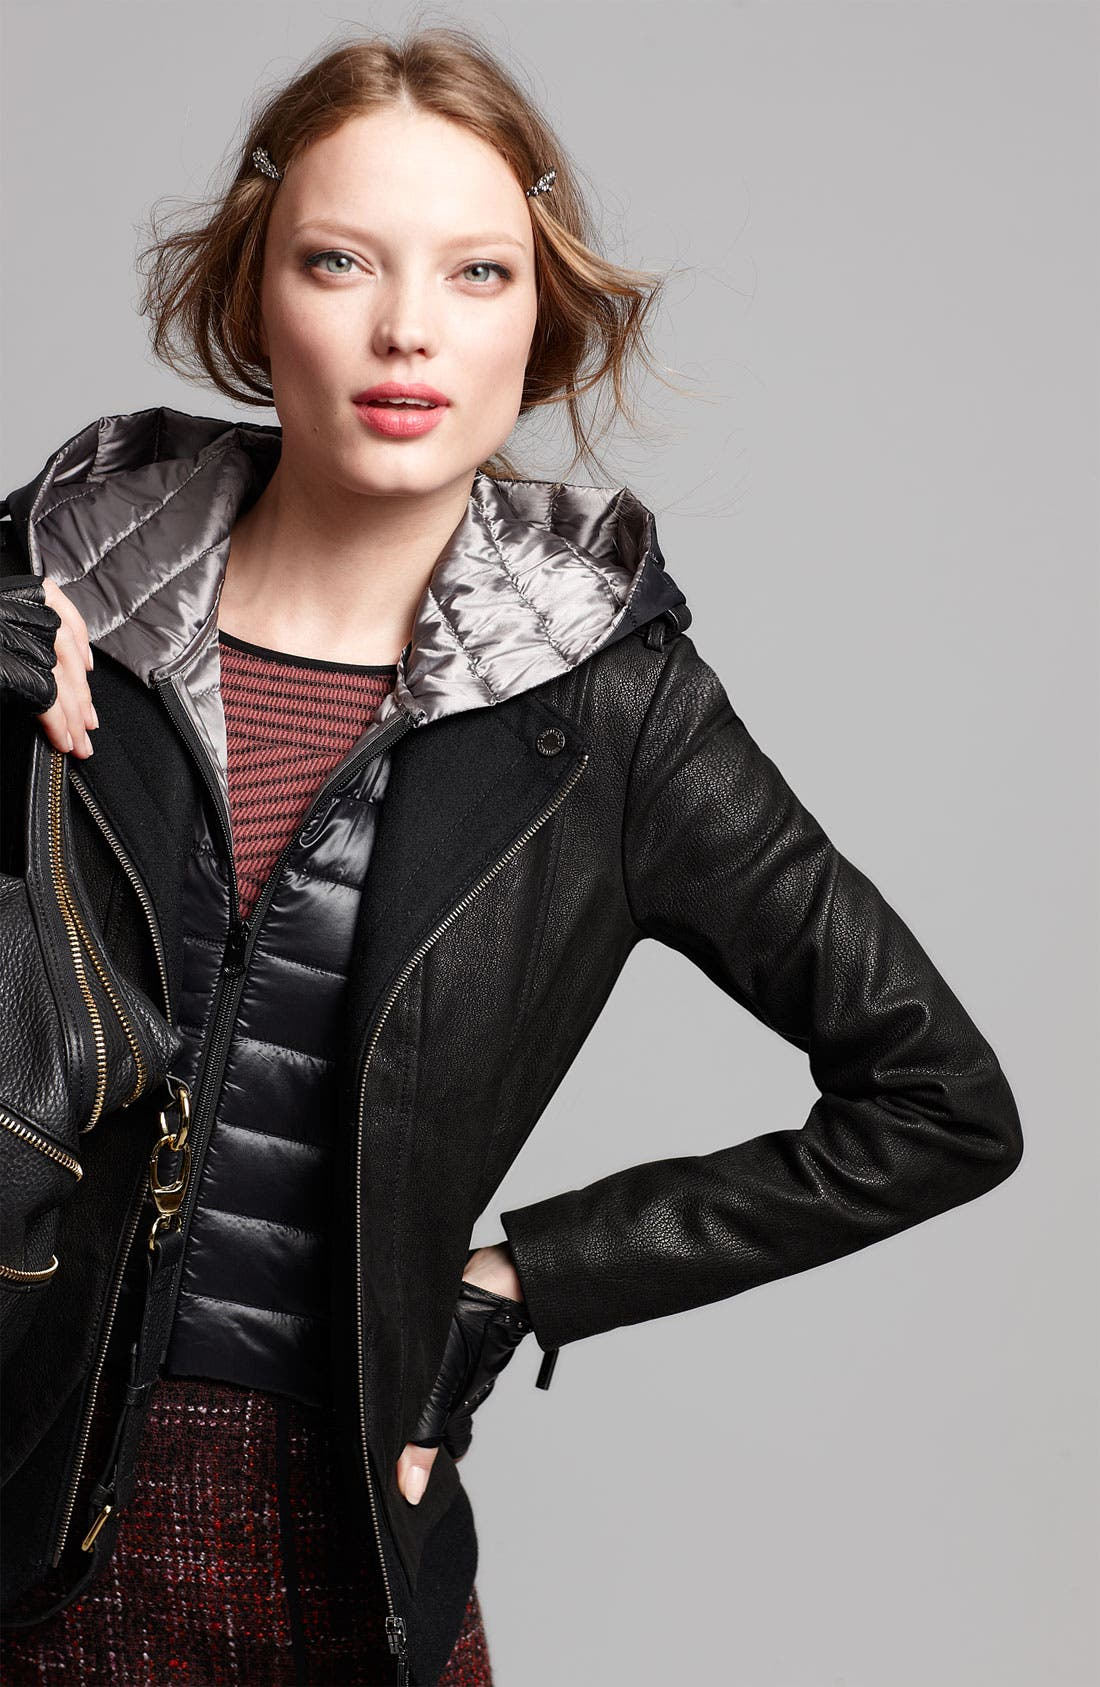 Main Image - Bernardo Leather Jacket, Halogen® Sweater & Skirt